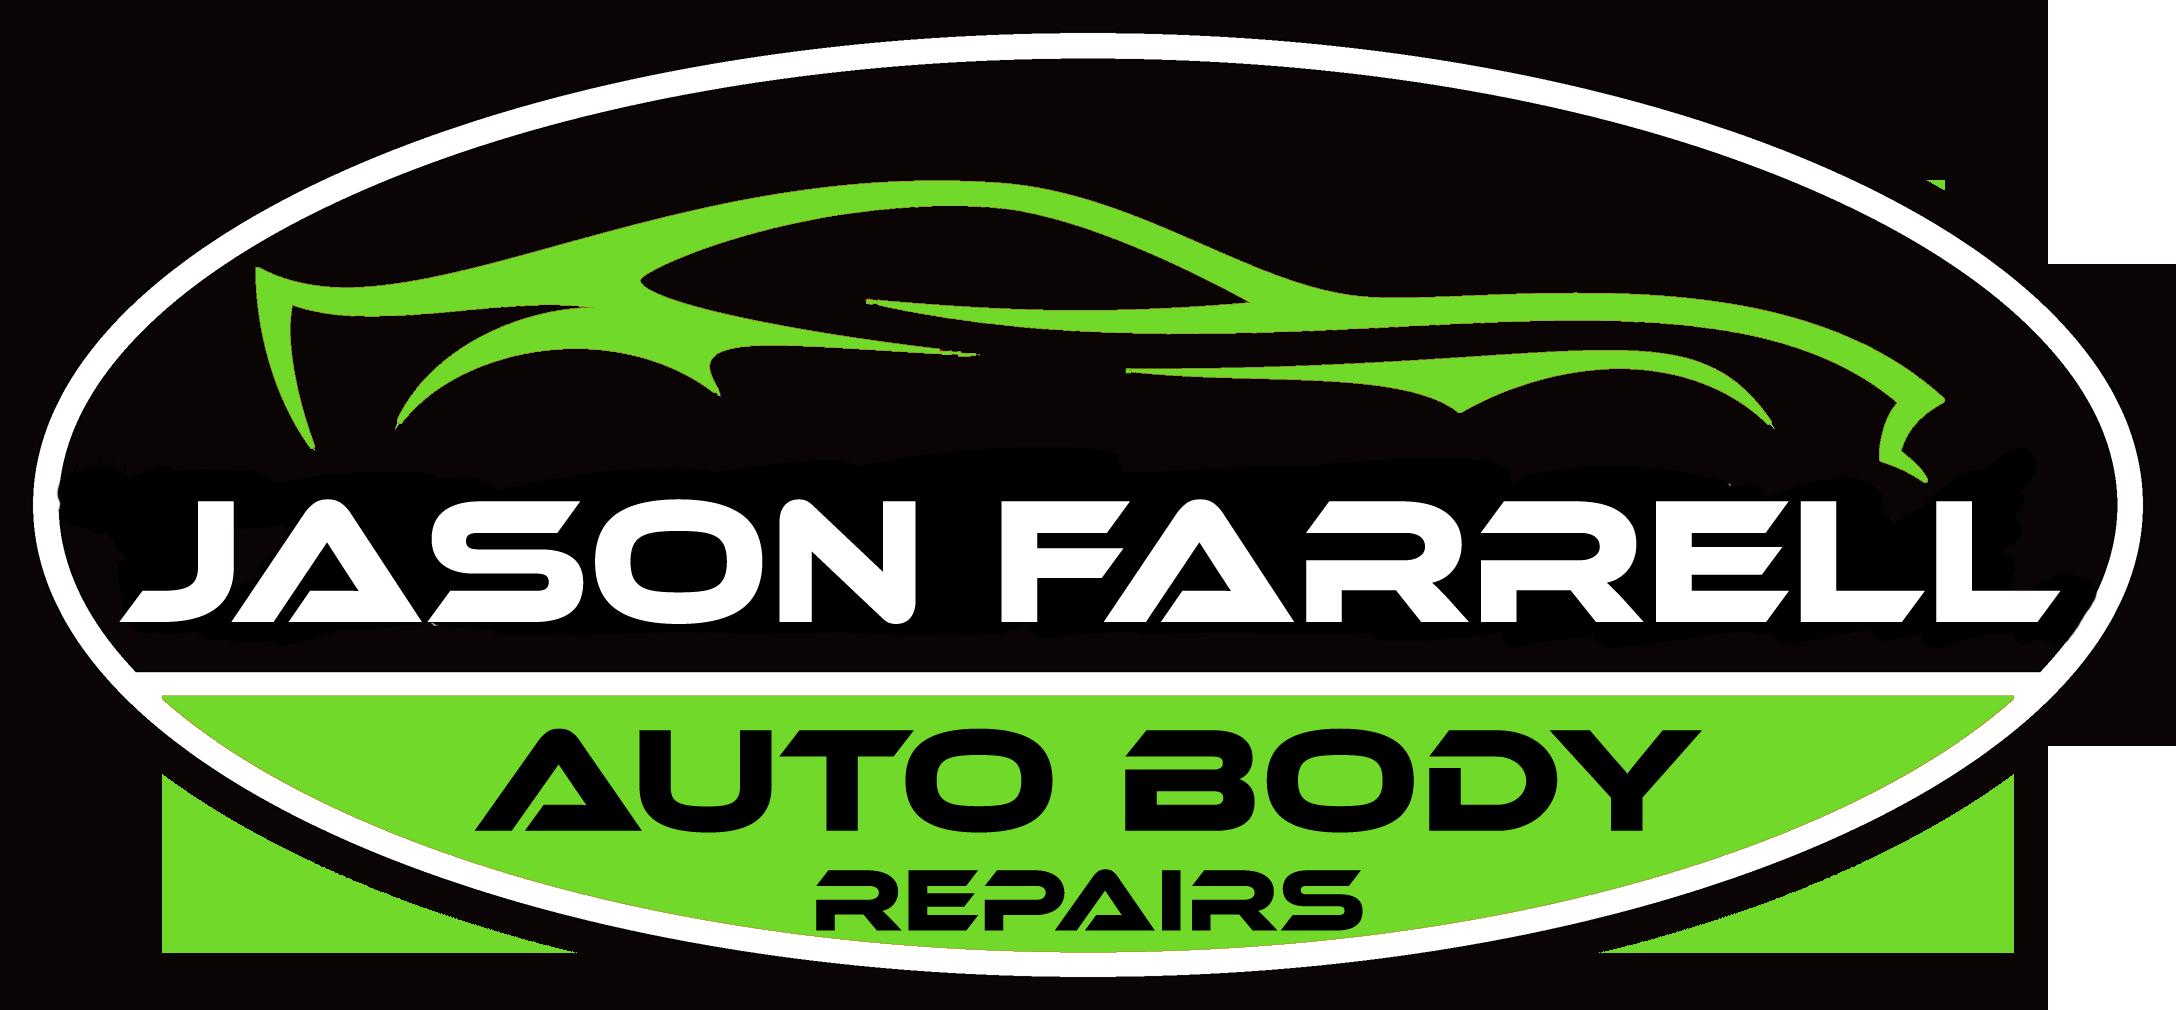 Jason Farrell Autobody Repairs